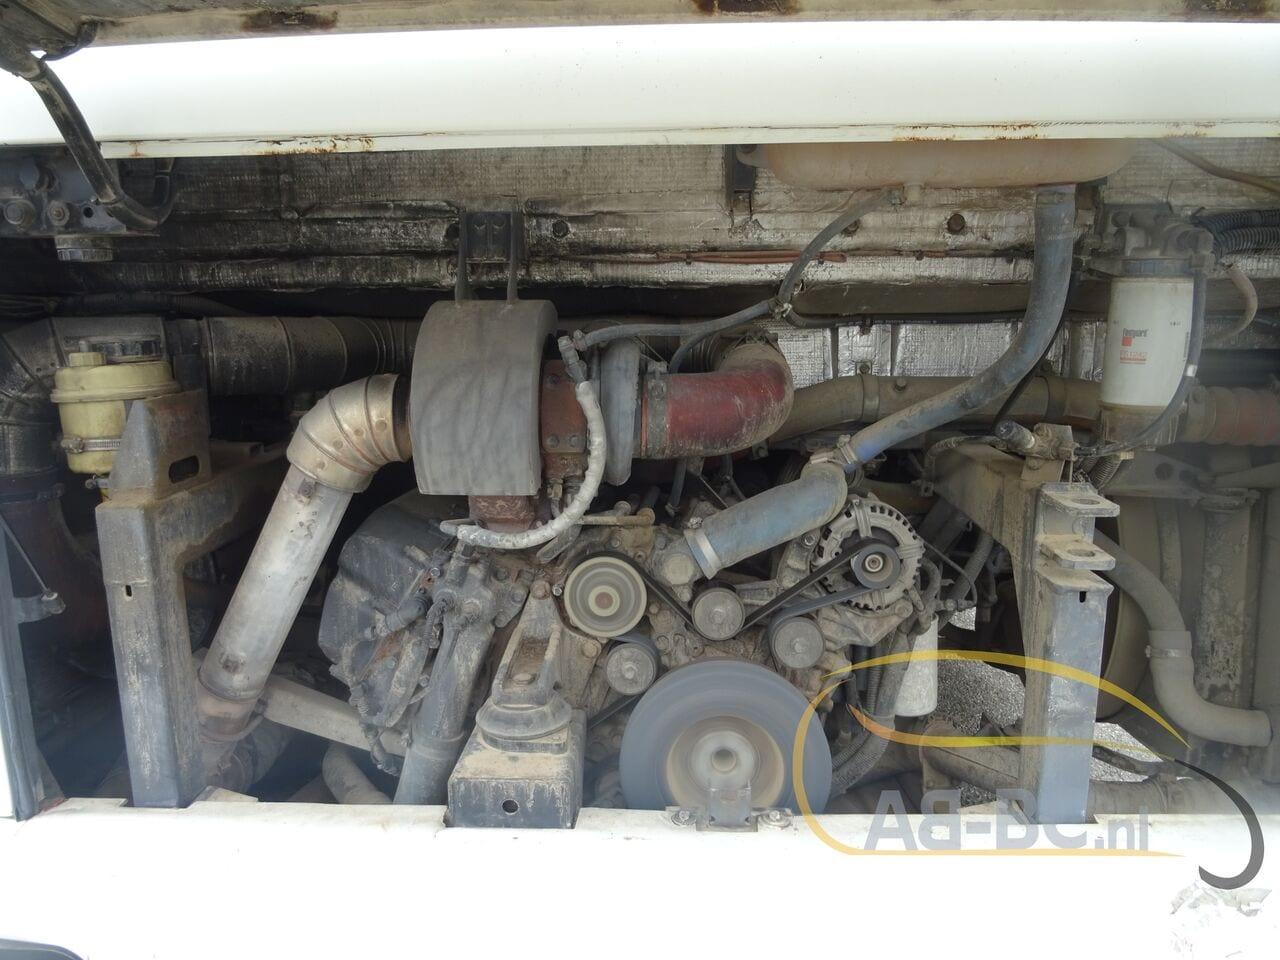 interurban-busIVECO-Irisbus-Recreo-64-Seats---1626159820002476024_big_de7013a94d08a00095106316ad77e780--21071309575983154500